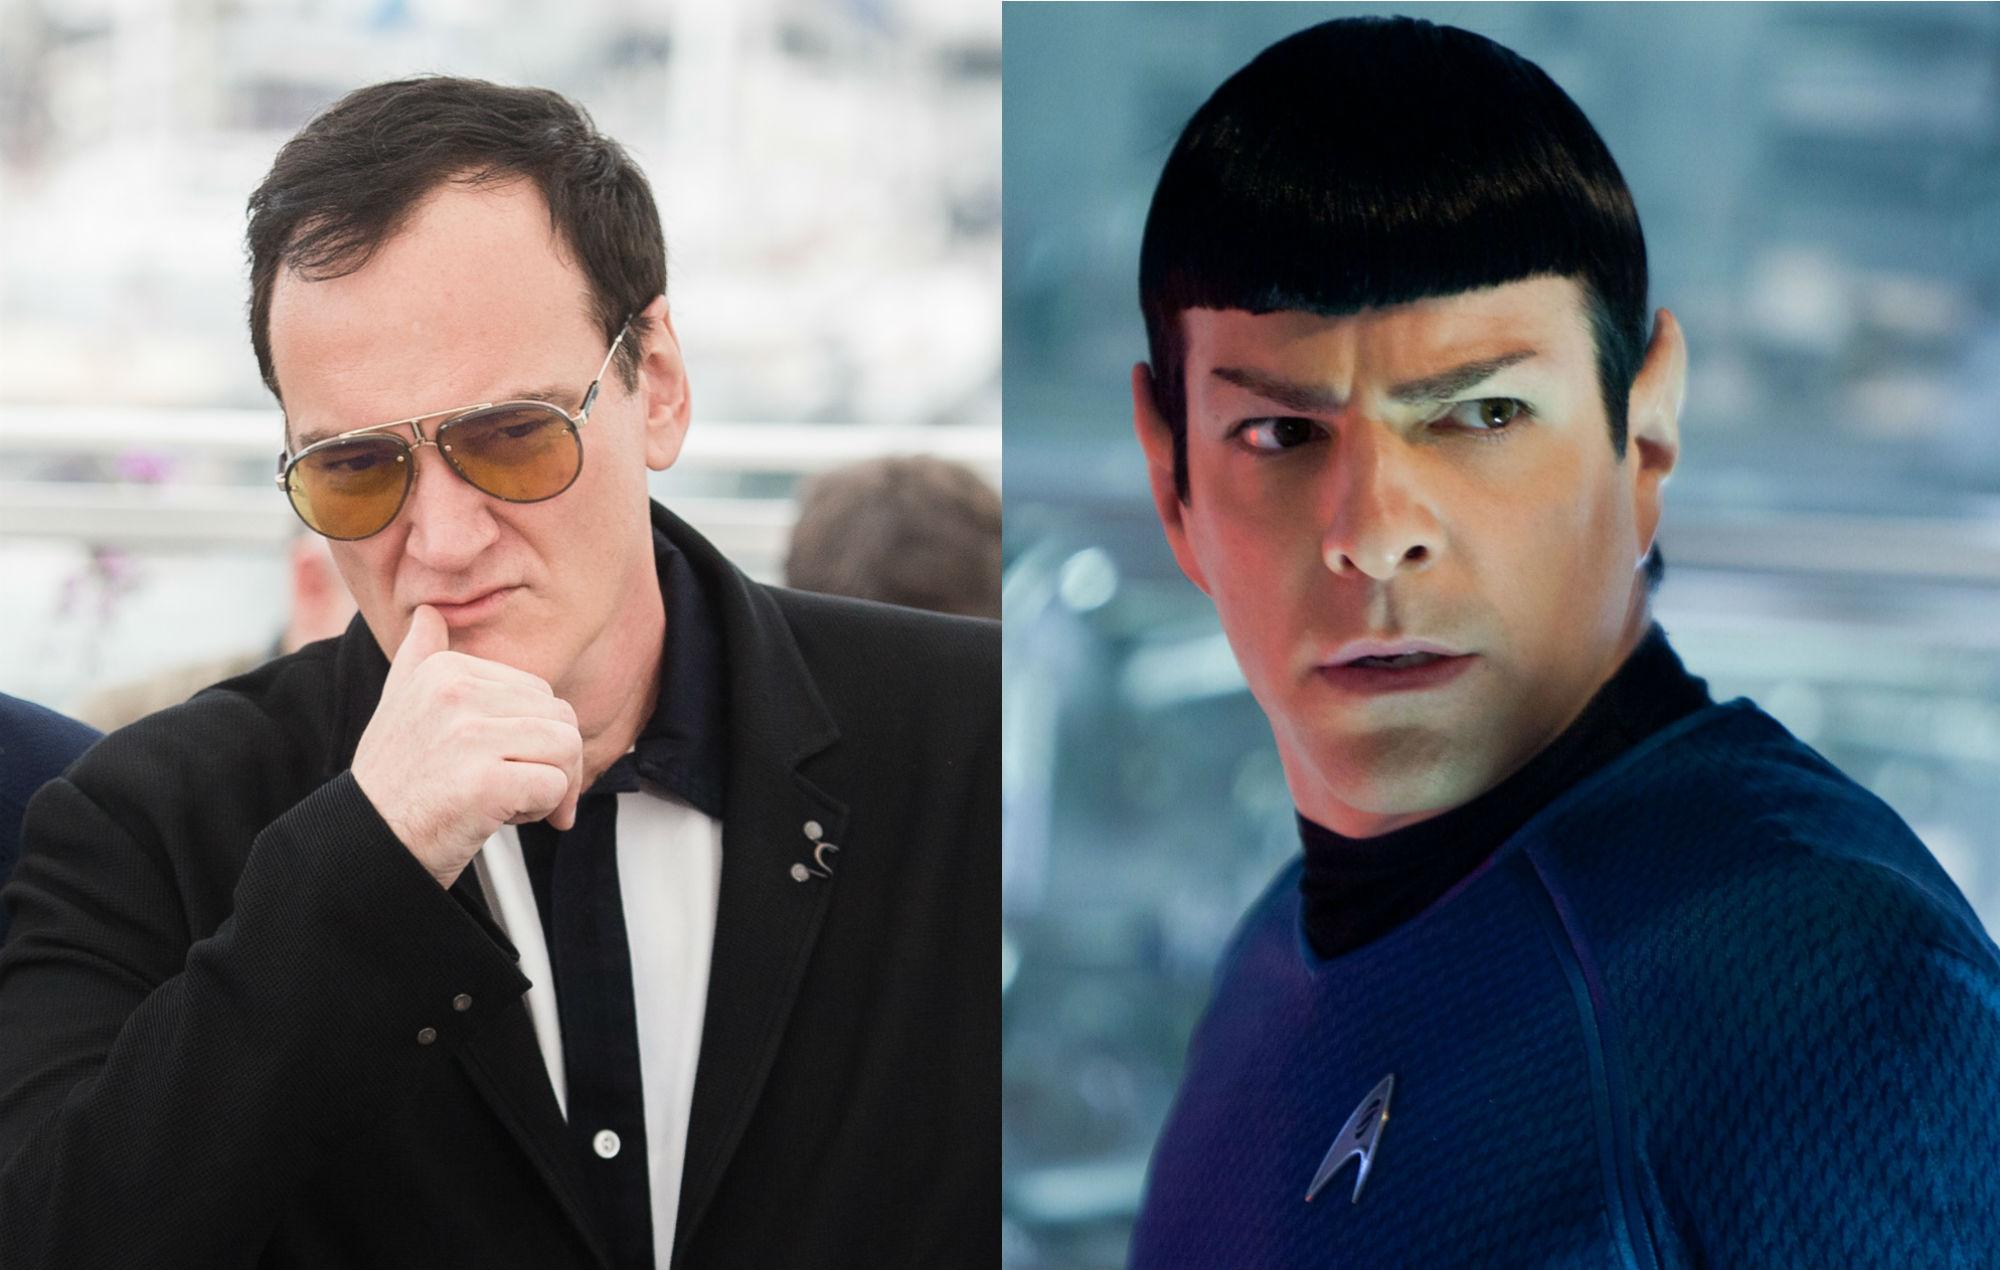 Quentin Tarantino / Star Trek